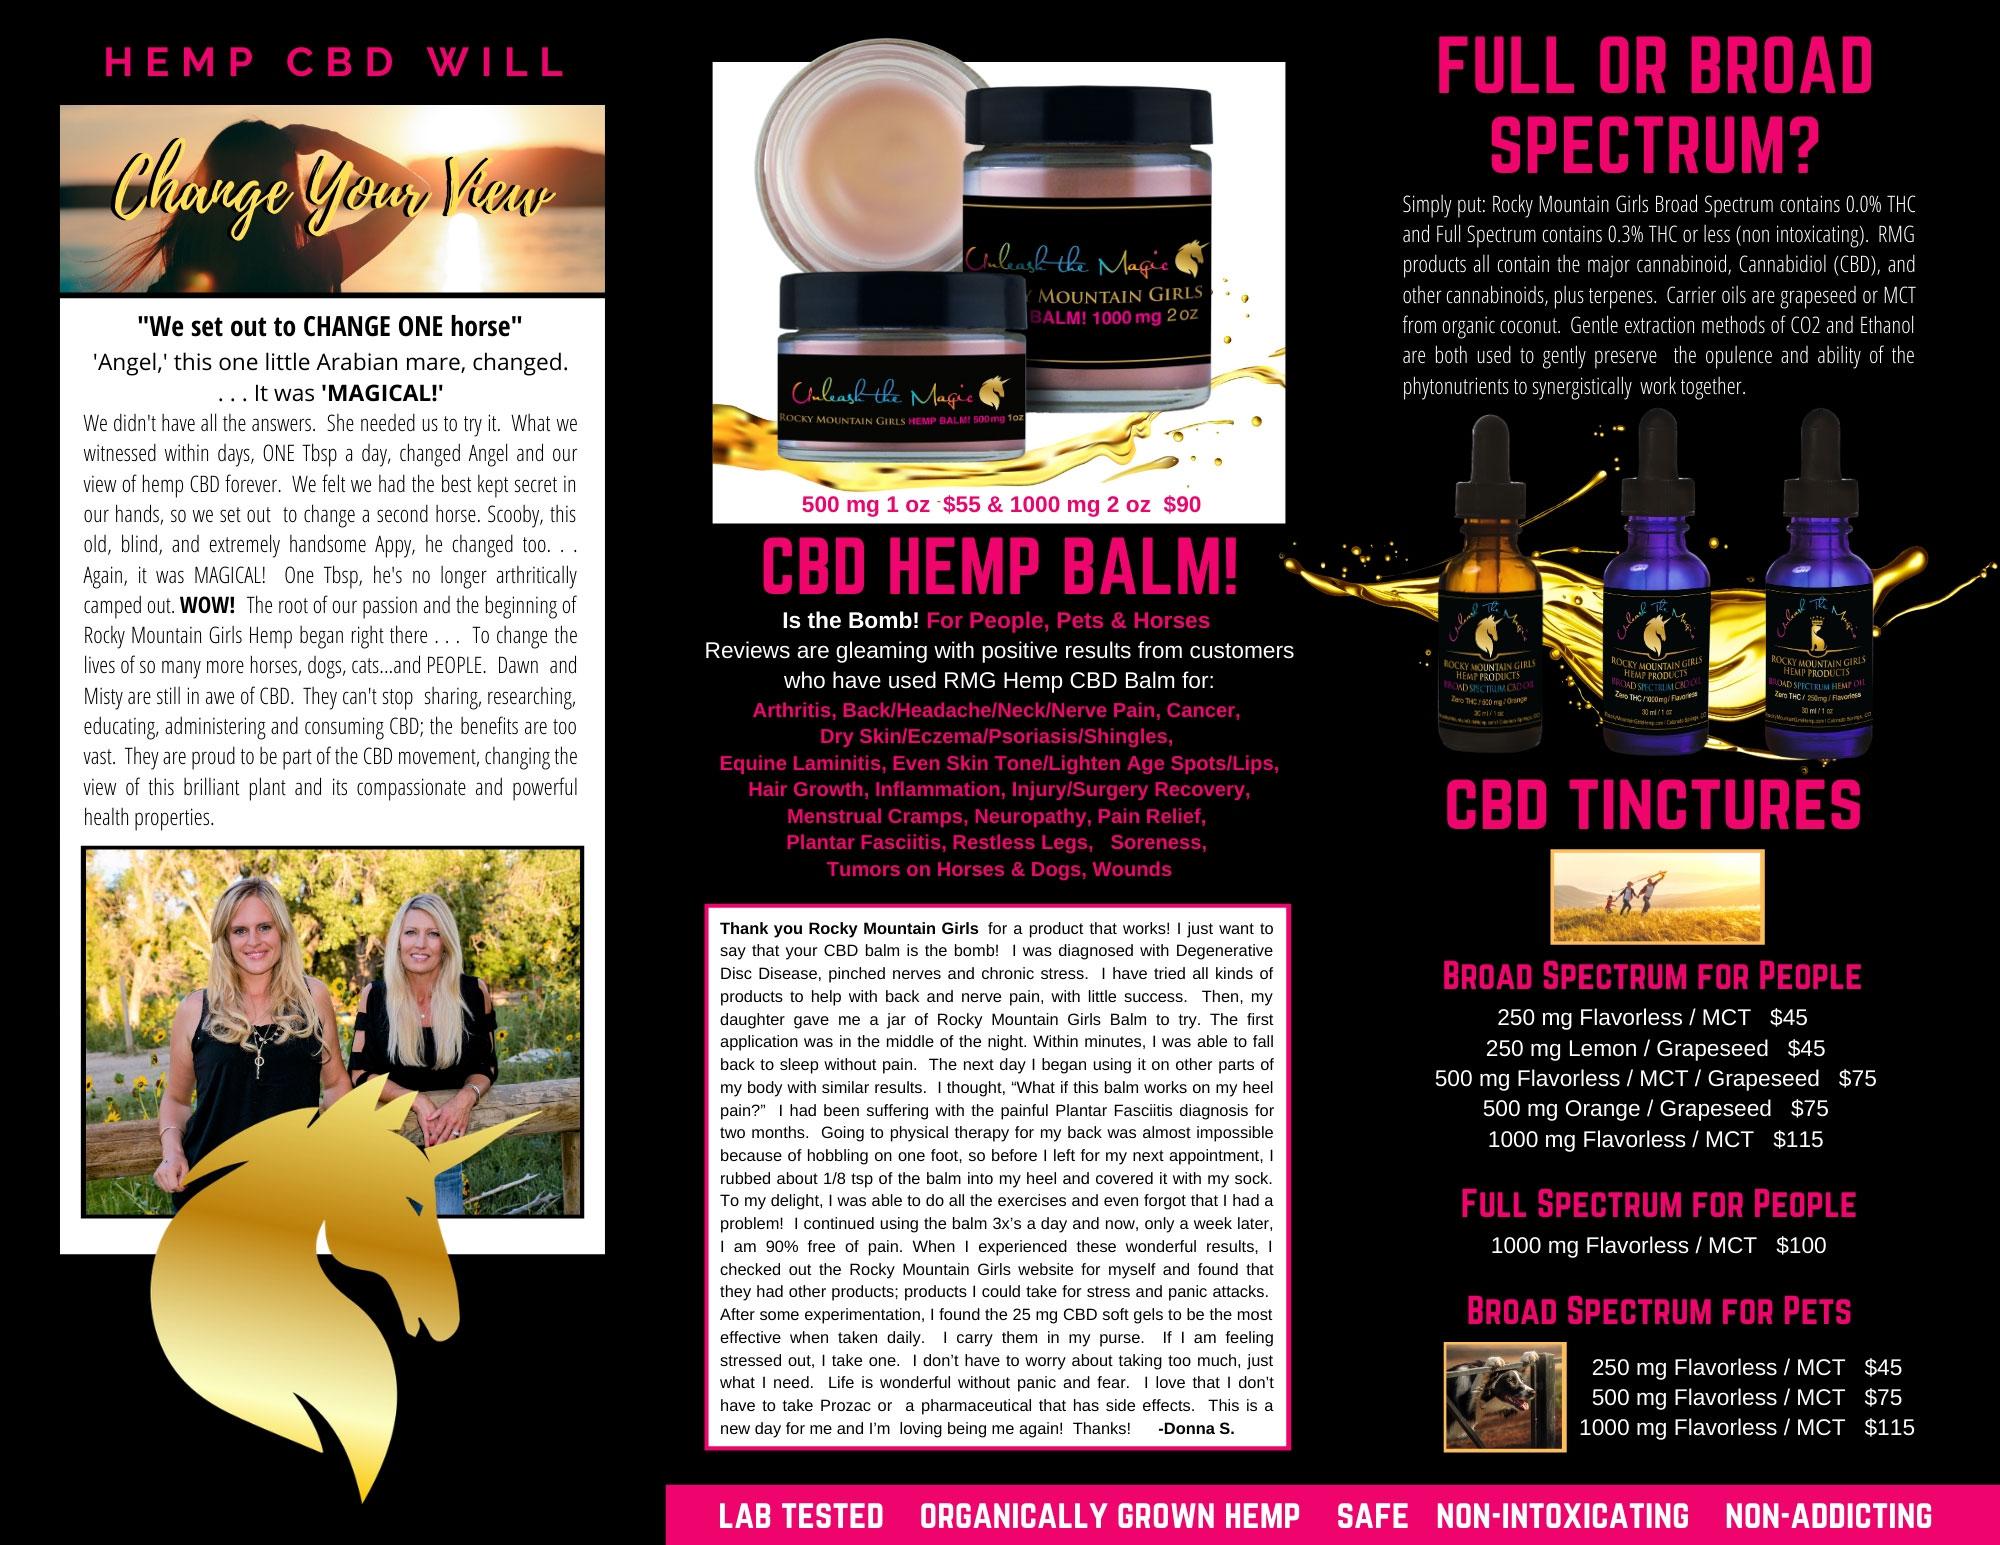 Rocky-Mountain-Girls-CBD-Hemp-Products-Brochure-inside